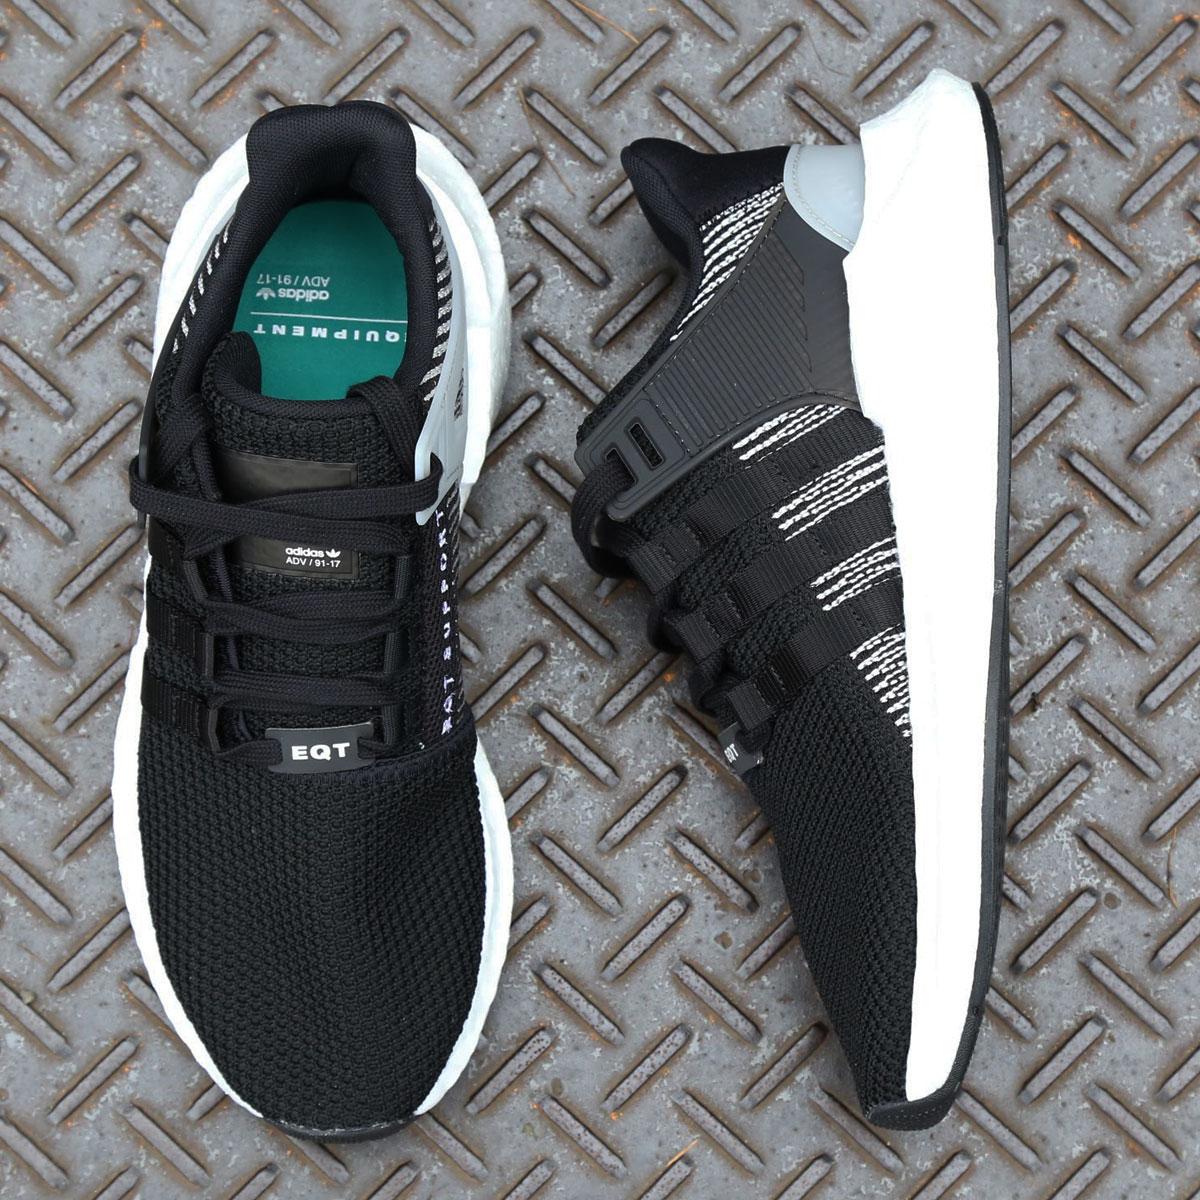 adidas Originals EQT SUPPORT 93/17 (アディダス オリジナルス EQT サポート 93/17)CORE BLACK/CORE BLACK/RUNNING WHITE【メンズ スニーカー】17FW-S